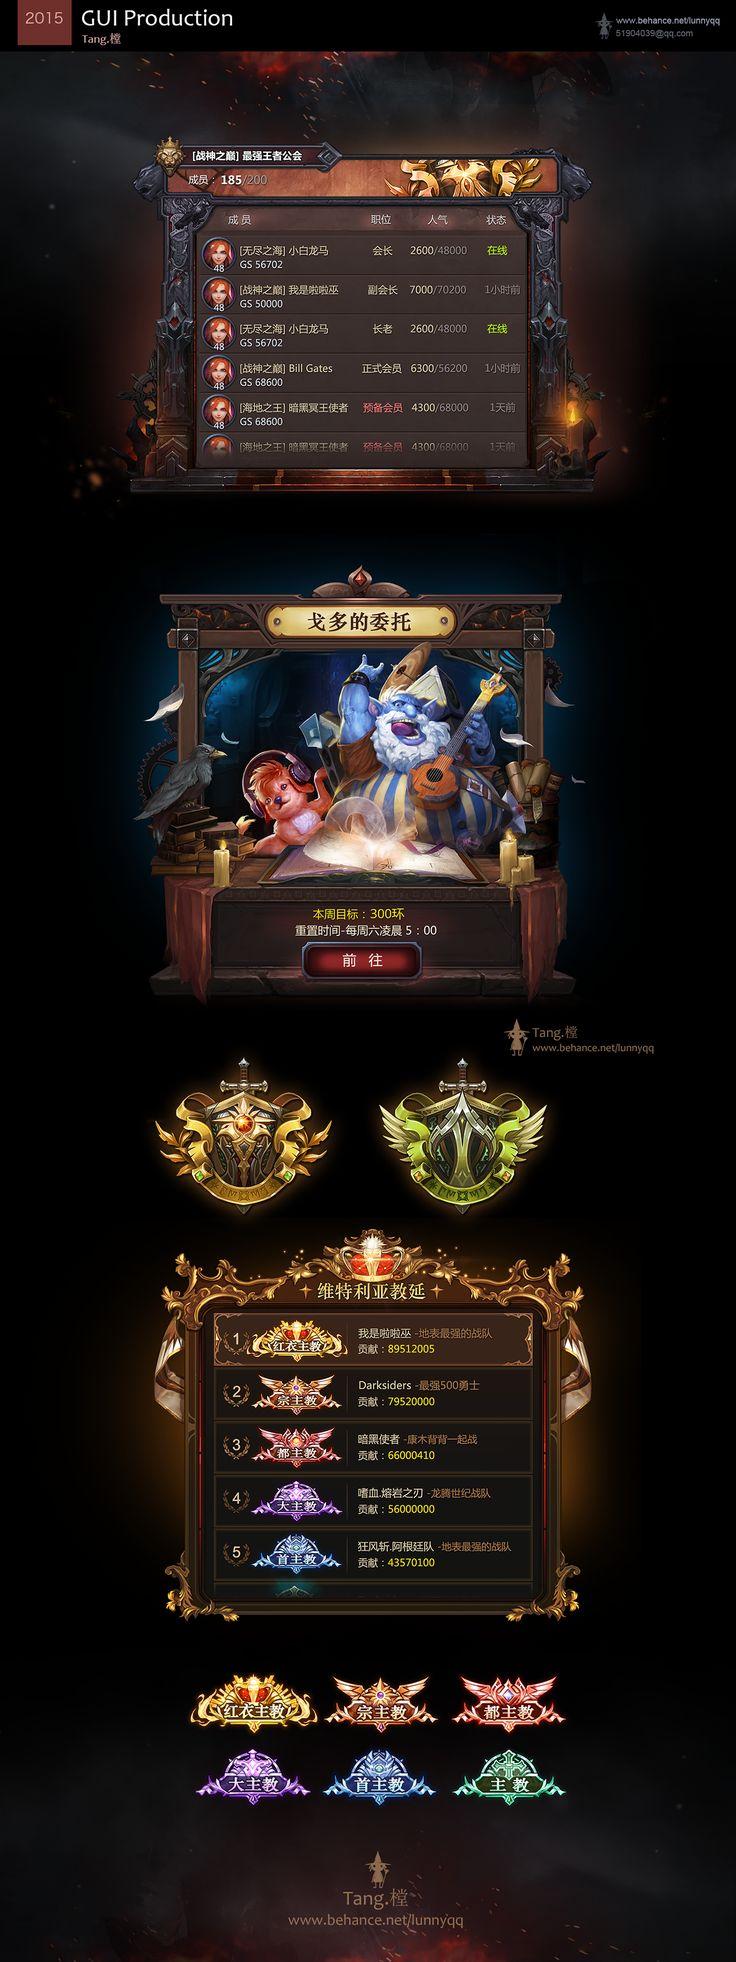 2015 Gui design.Tang L on Behance